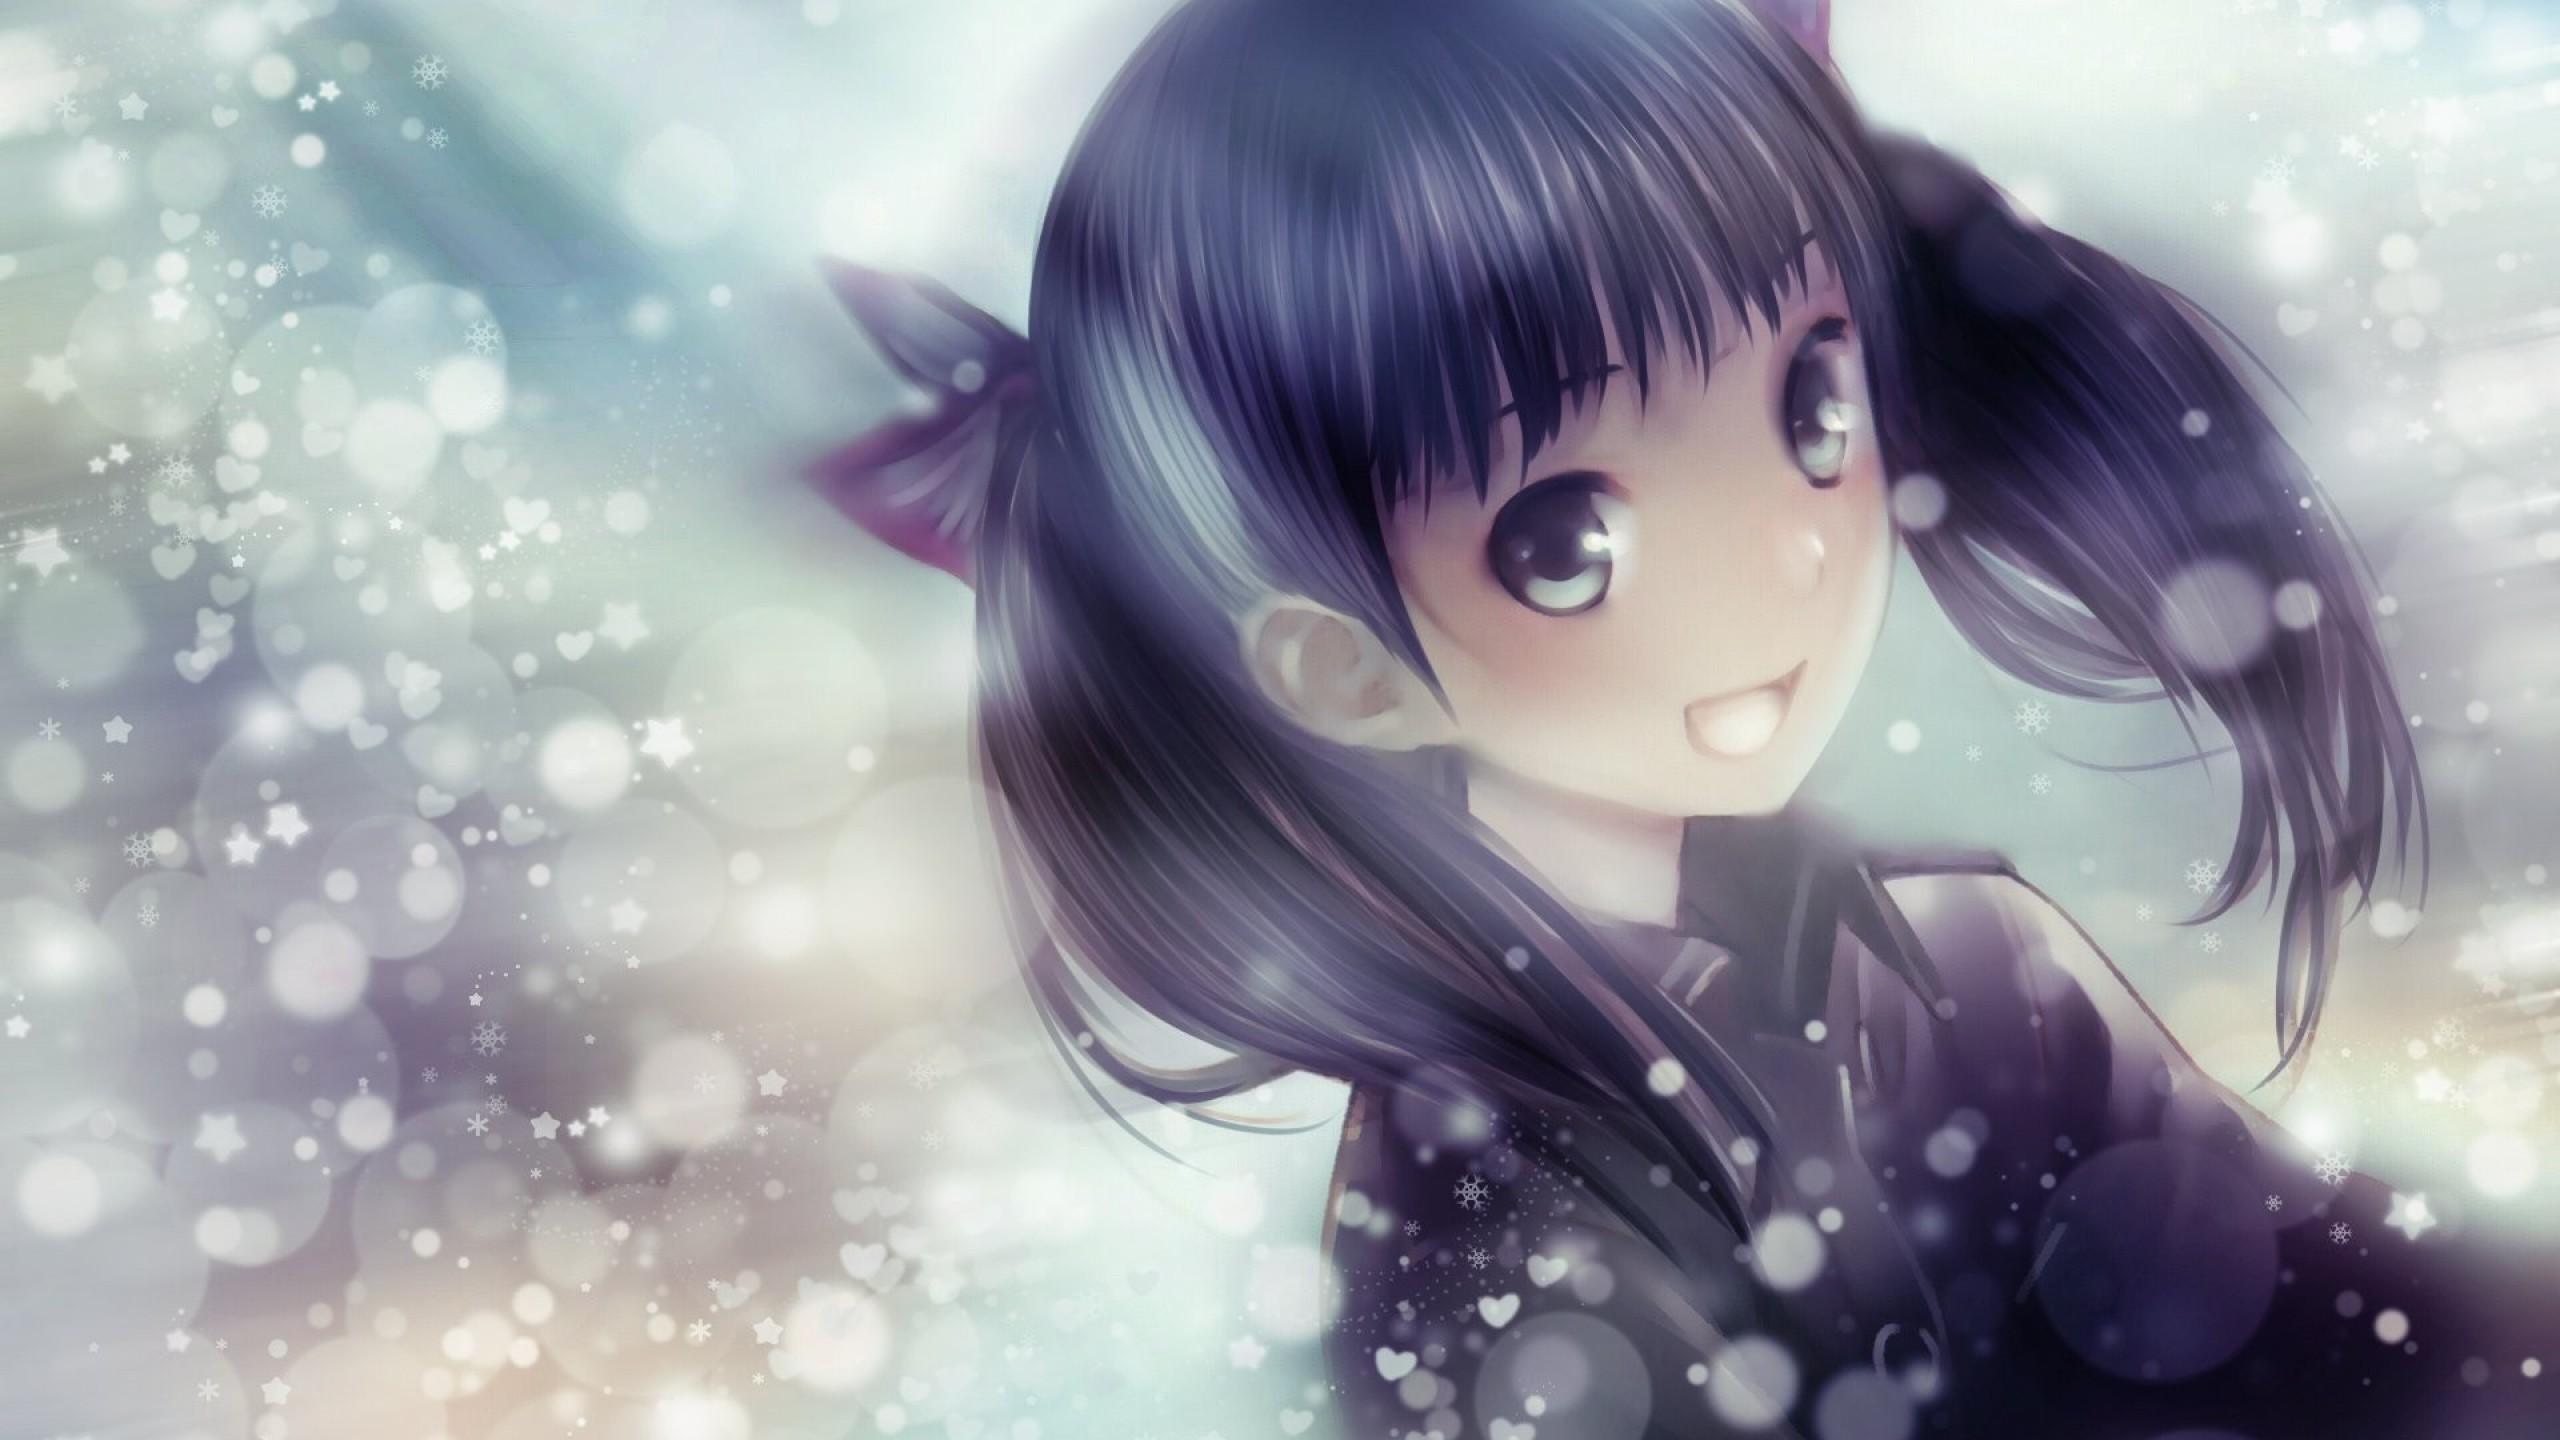 Anime cute girl hd wallpaper - Cute anime girl wallpaper ...